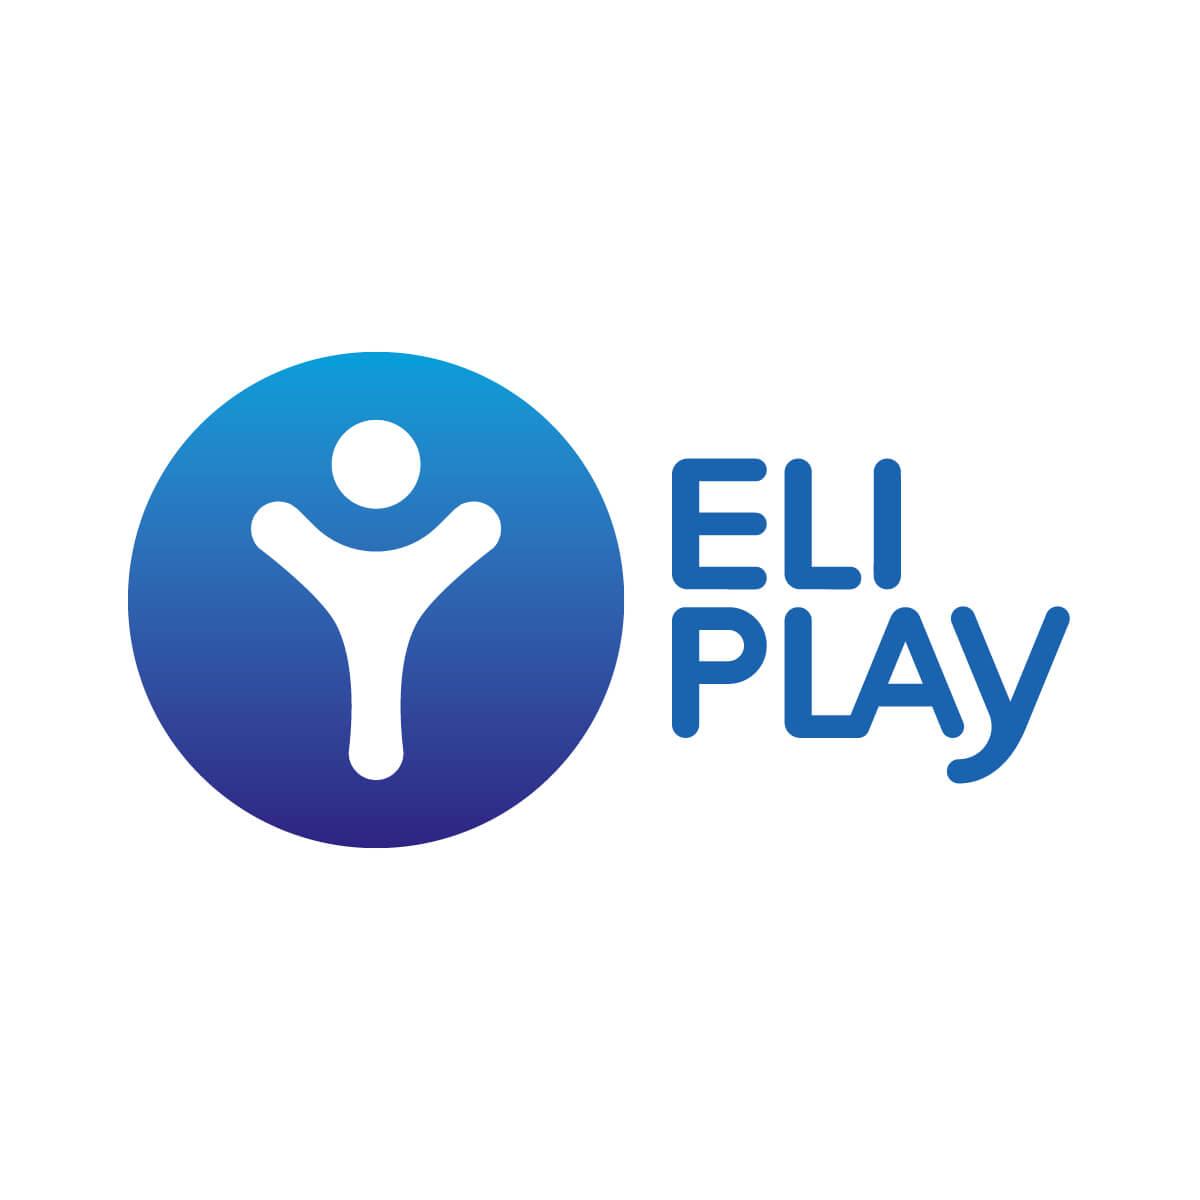 Eli-play